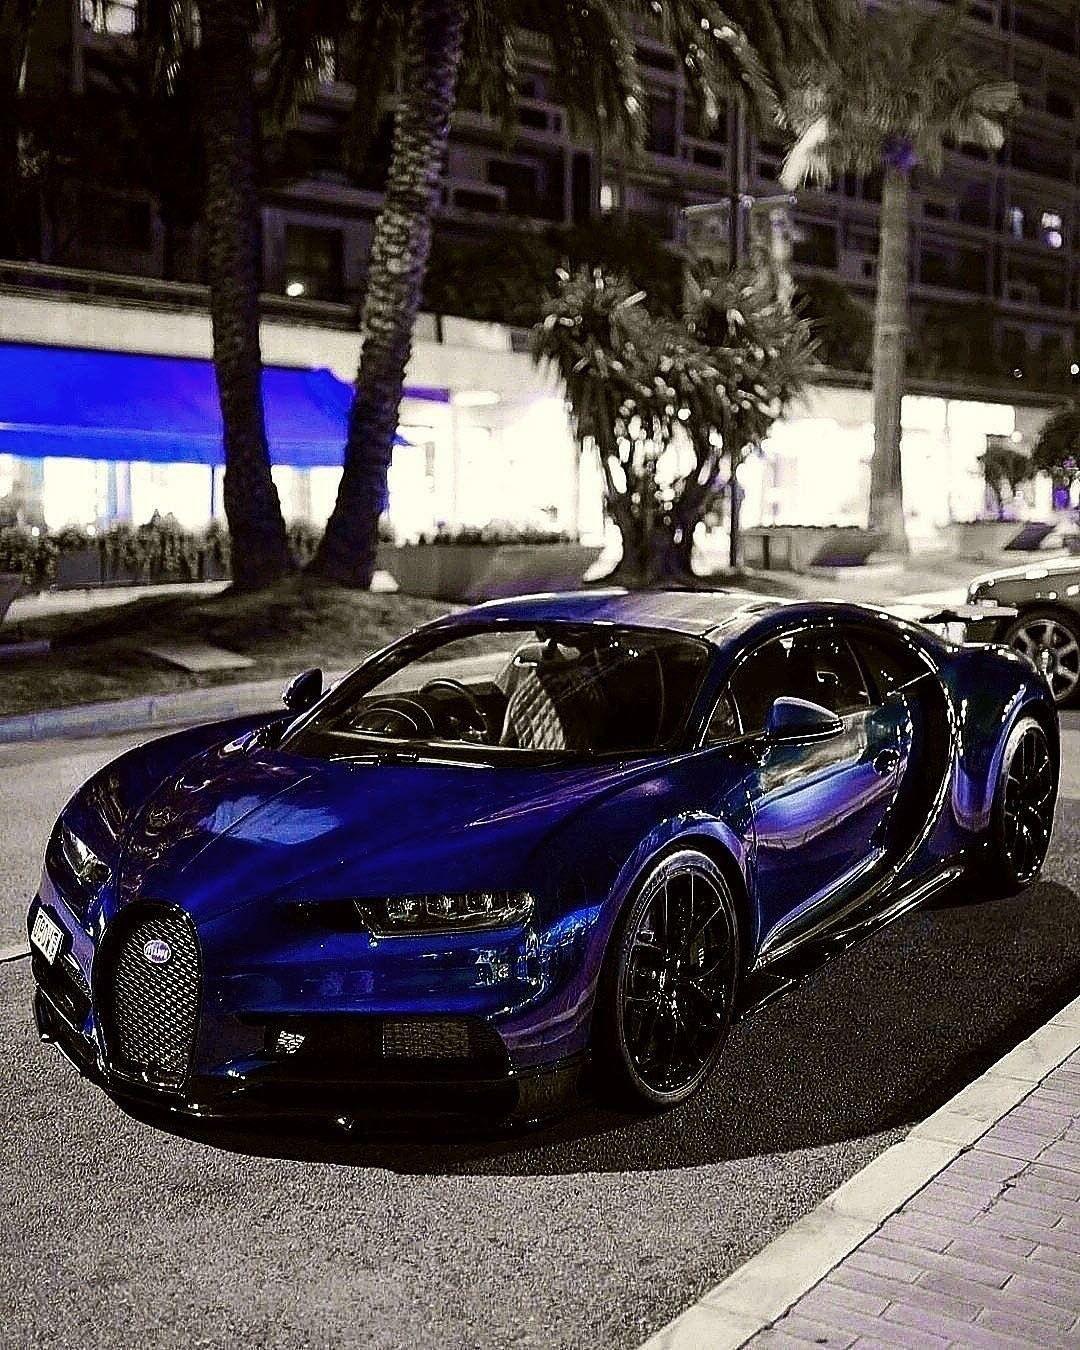 Bugatti Chiron Super Sport 300 Prototype 2019 Wallpapers: Amazing Colour Bugatti Blue Bullet #bugattiveyron Amazing